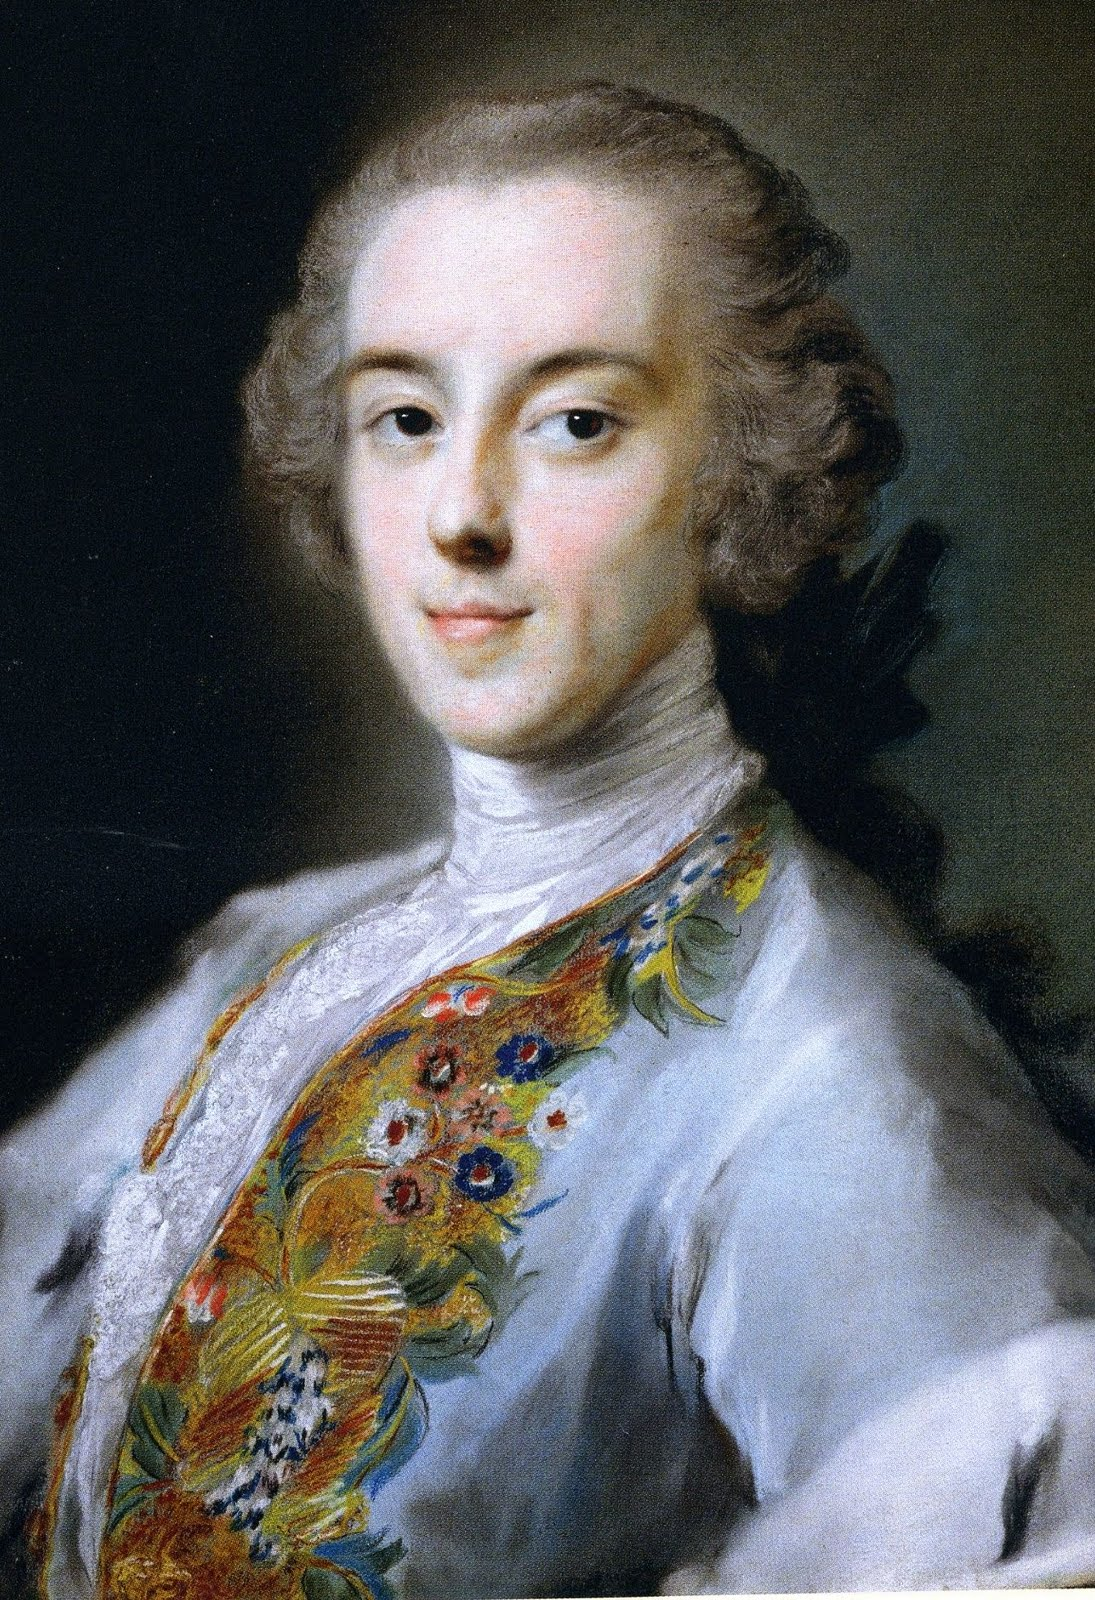 Spencer Alley: Old Pastel Portraits